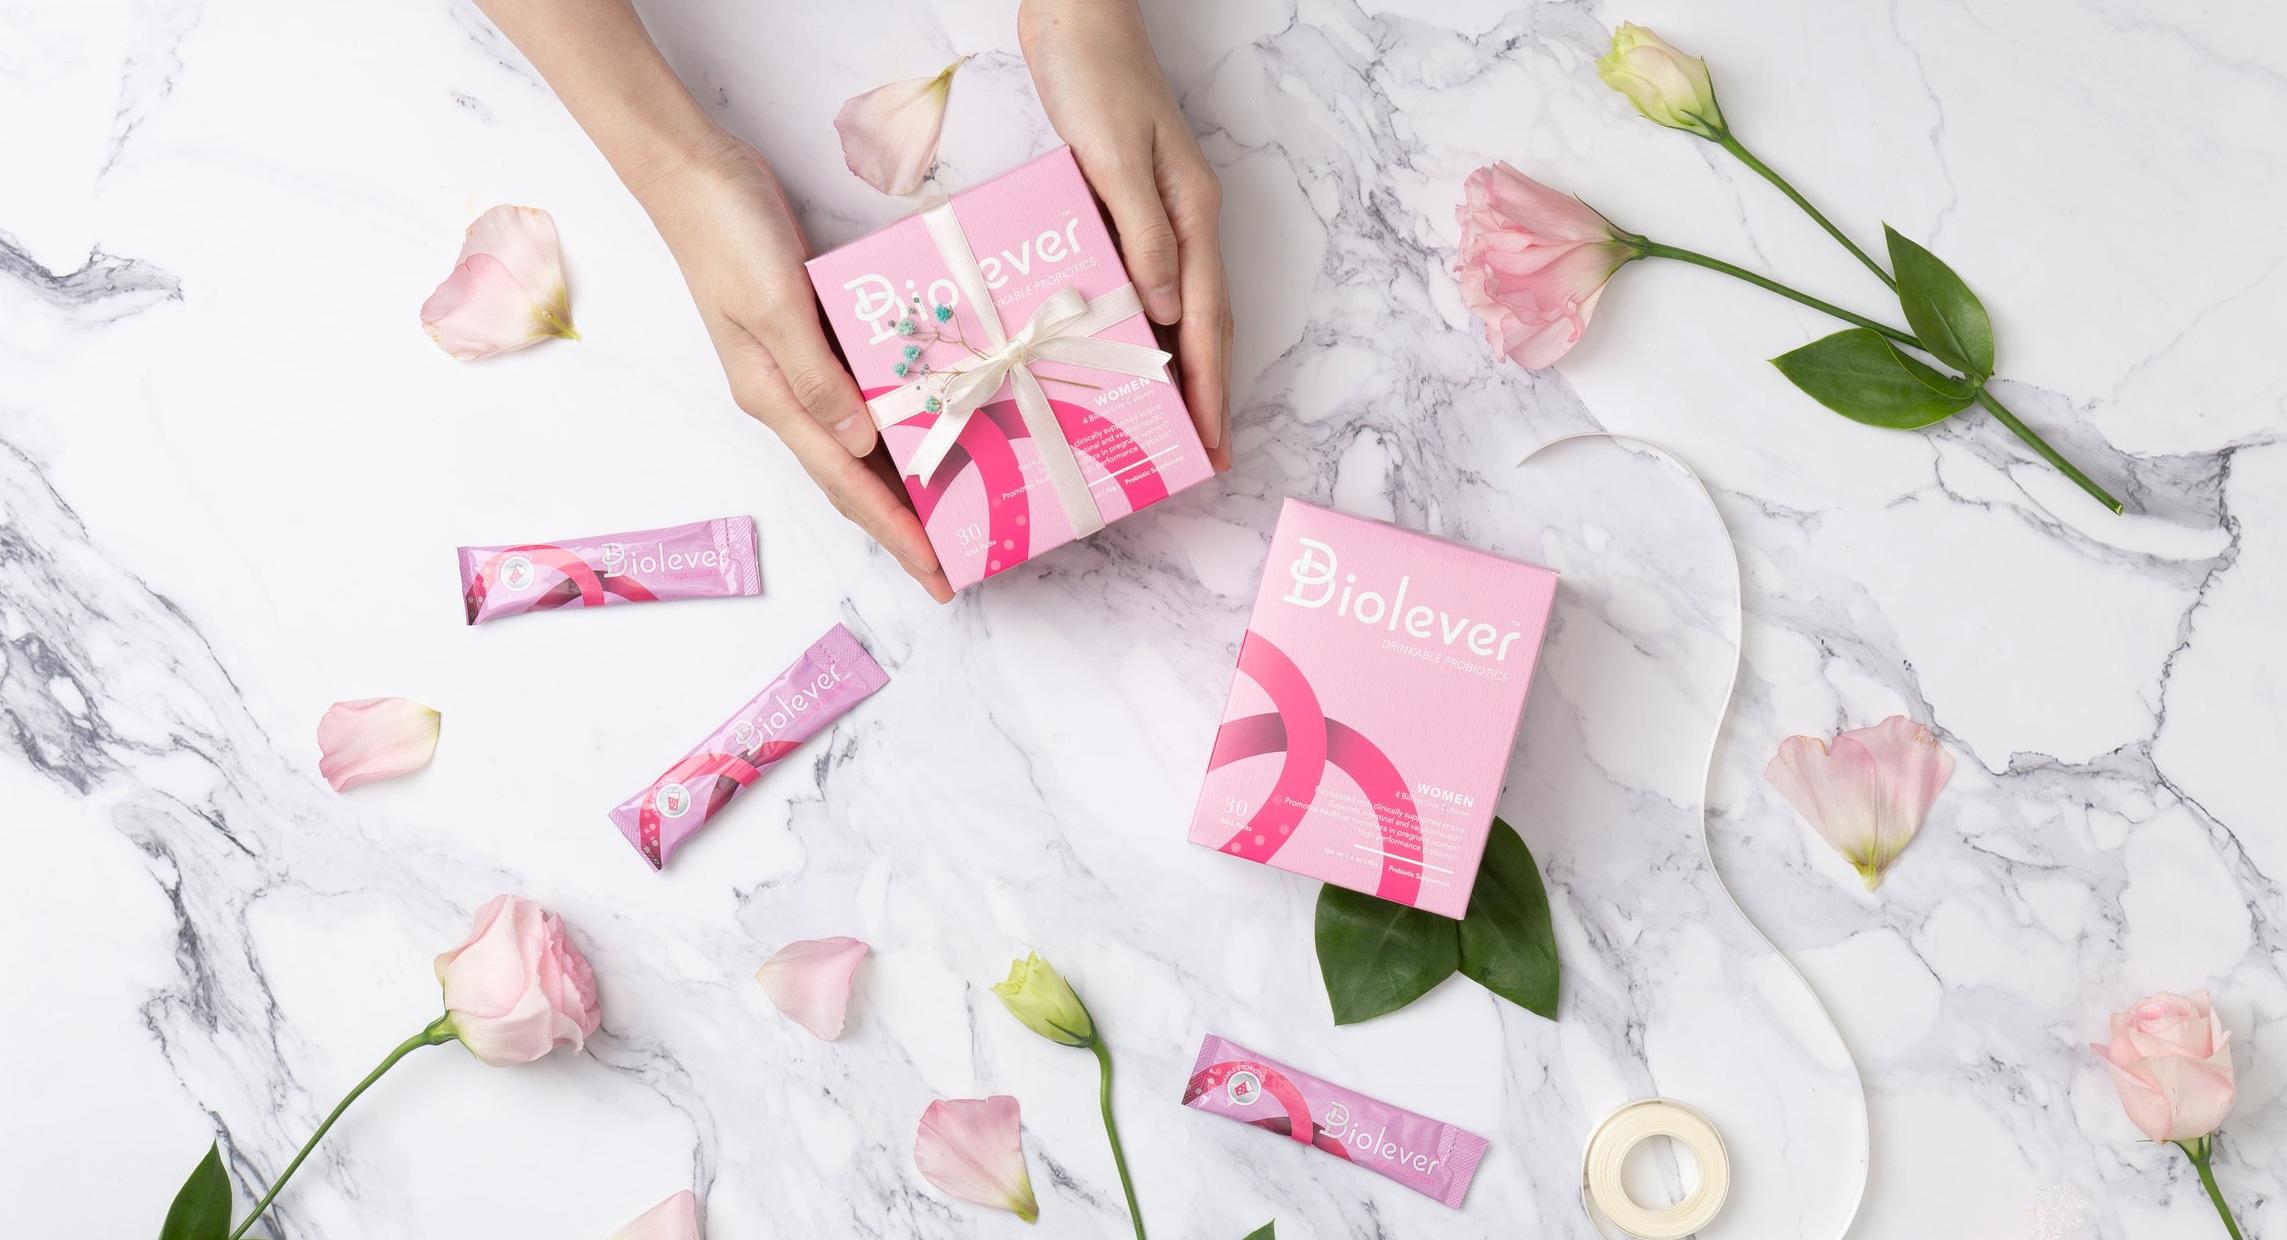 Biolever women probiotics with pink rose international women day gift ideas